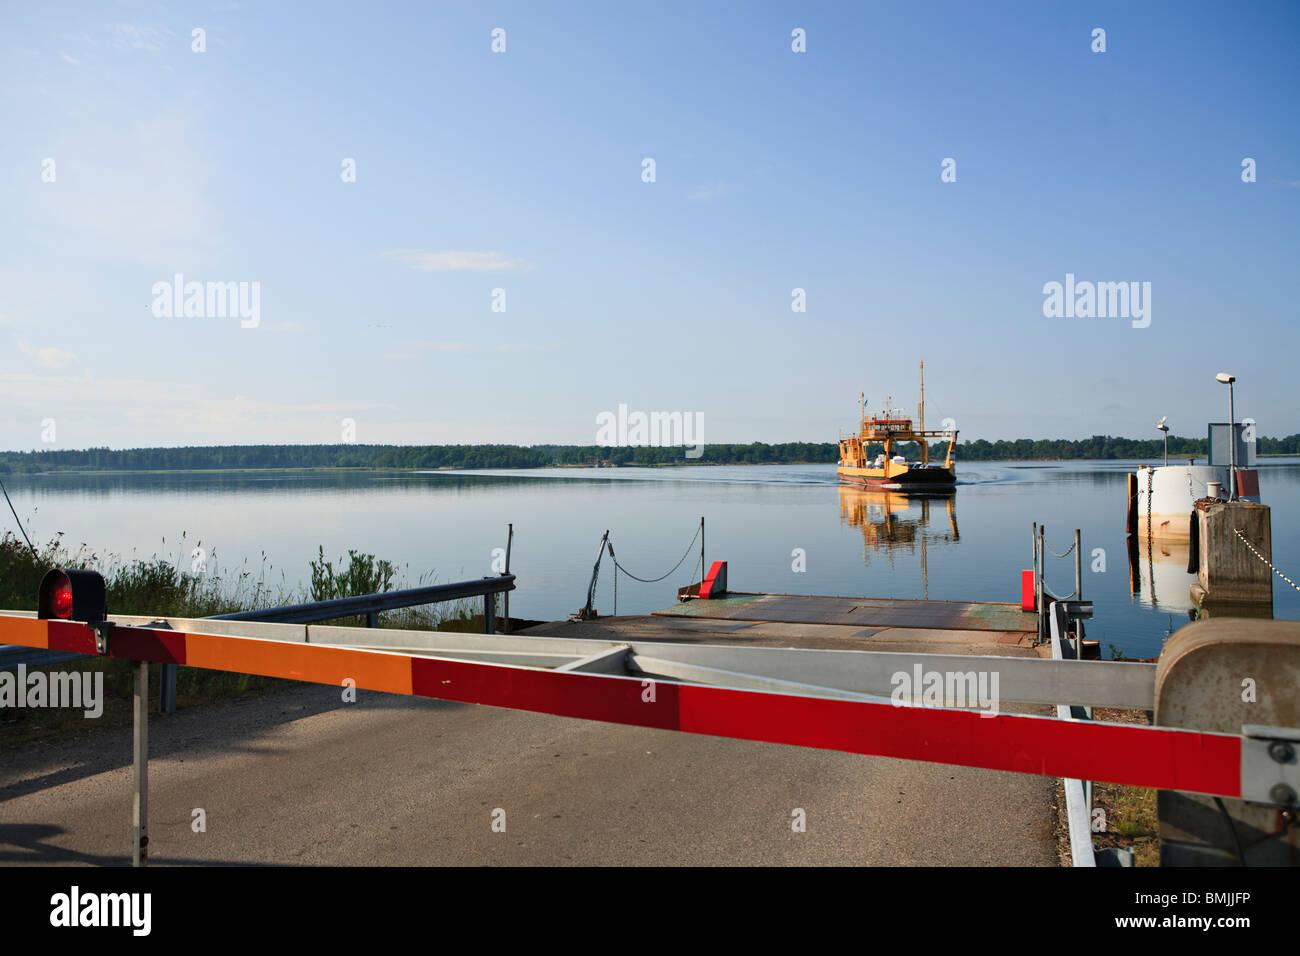 Scandinavia, Sweden, Ostergotland, Braviken, Ferry on lake - Stock Image